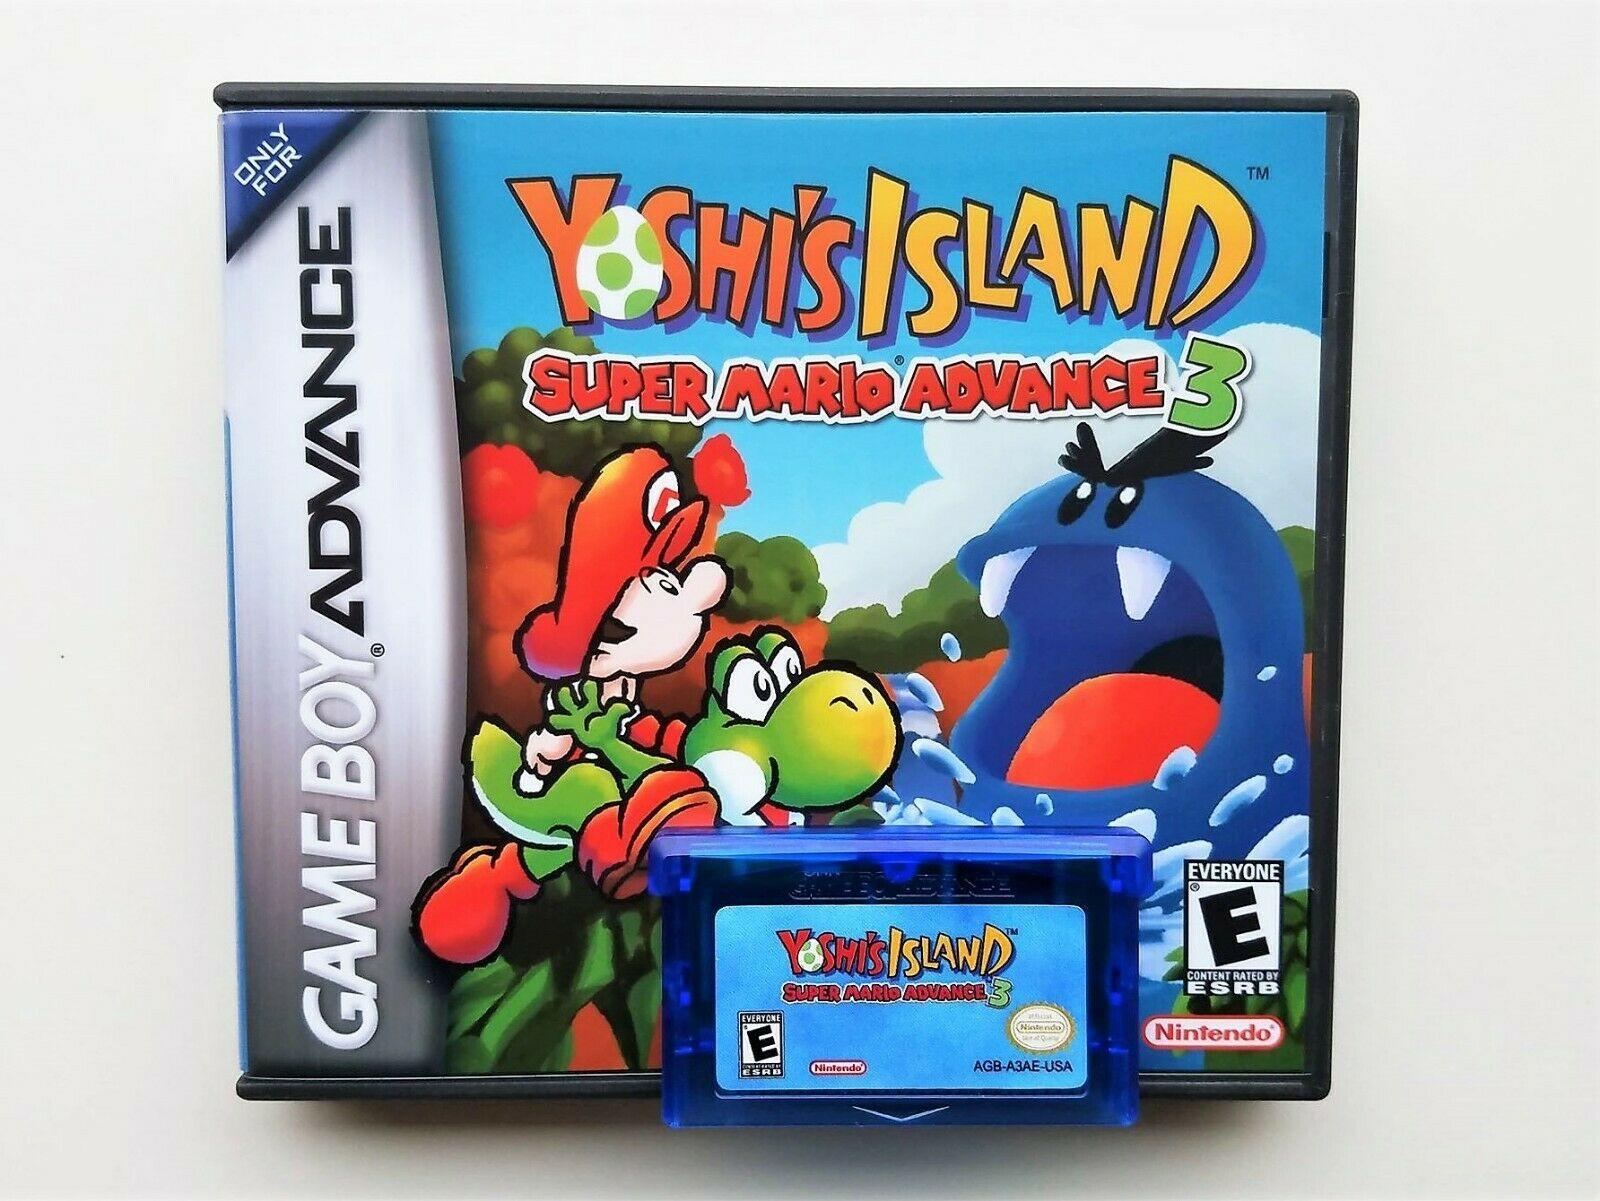 Yoshi's Island Super Mario World Advance 3 - Nintendo Game Boy Advance GBA (USA)